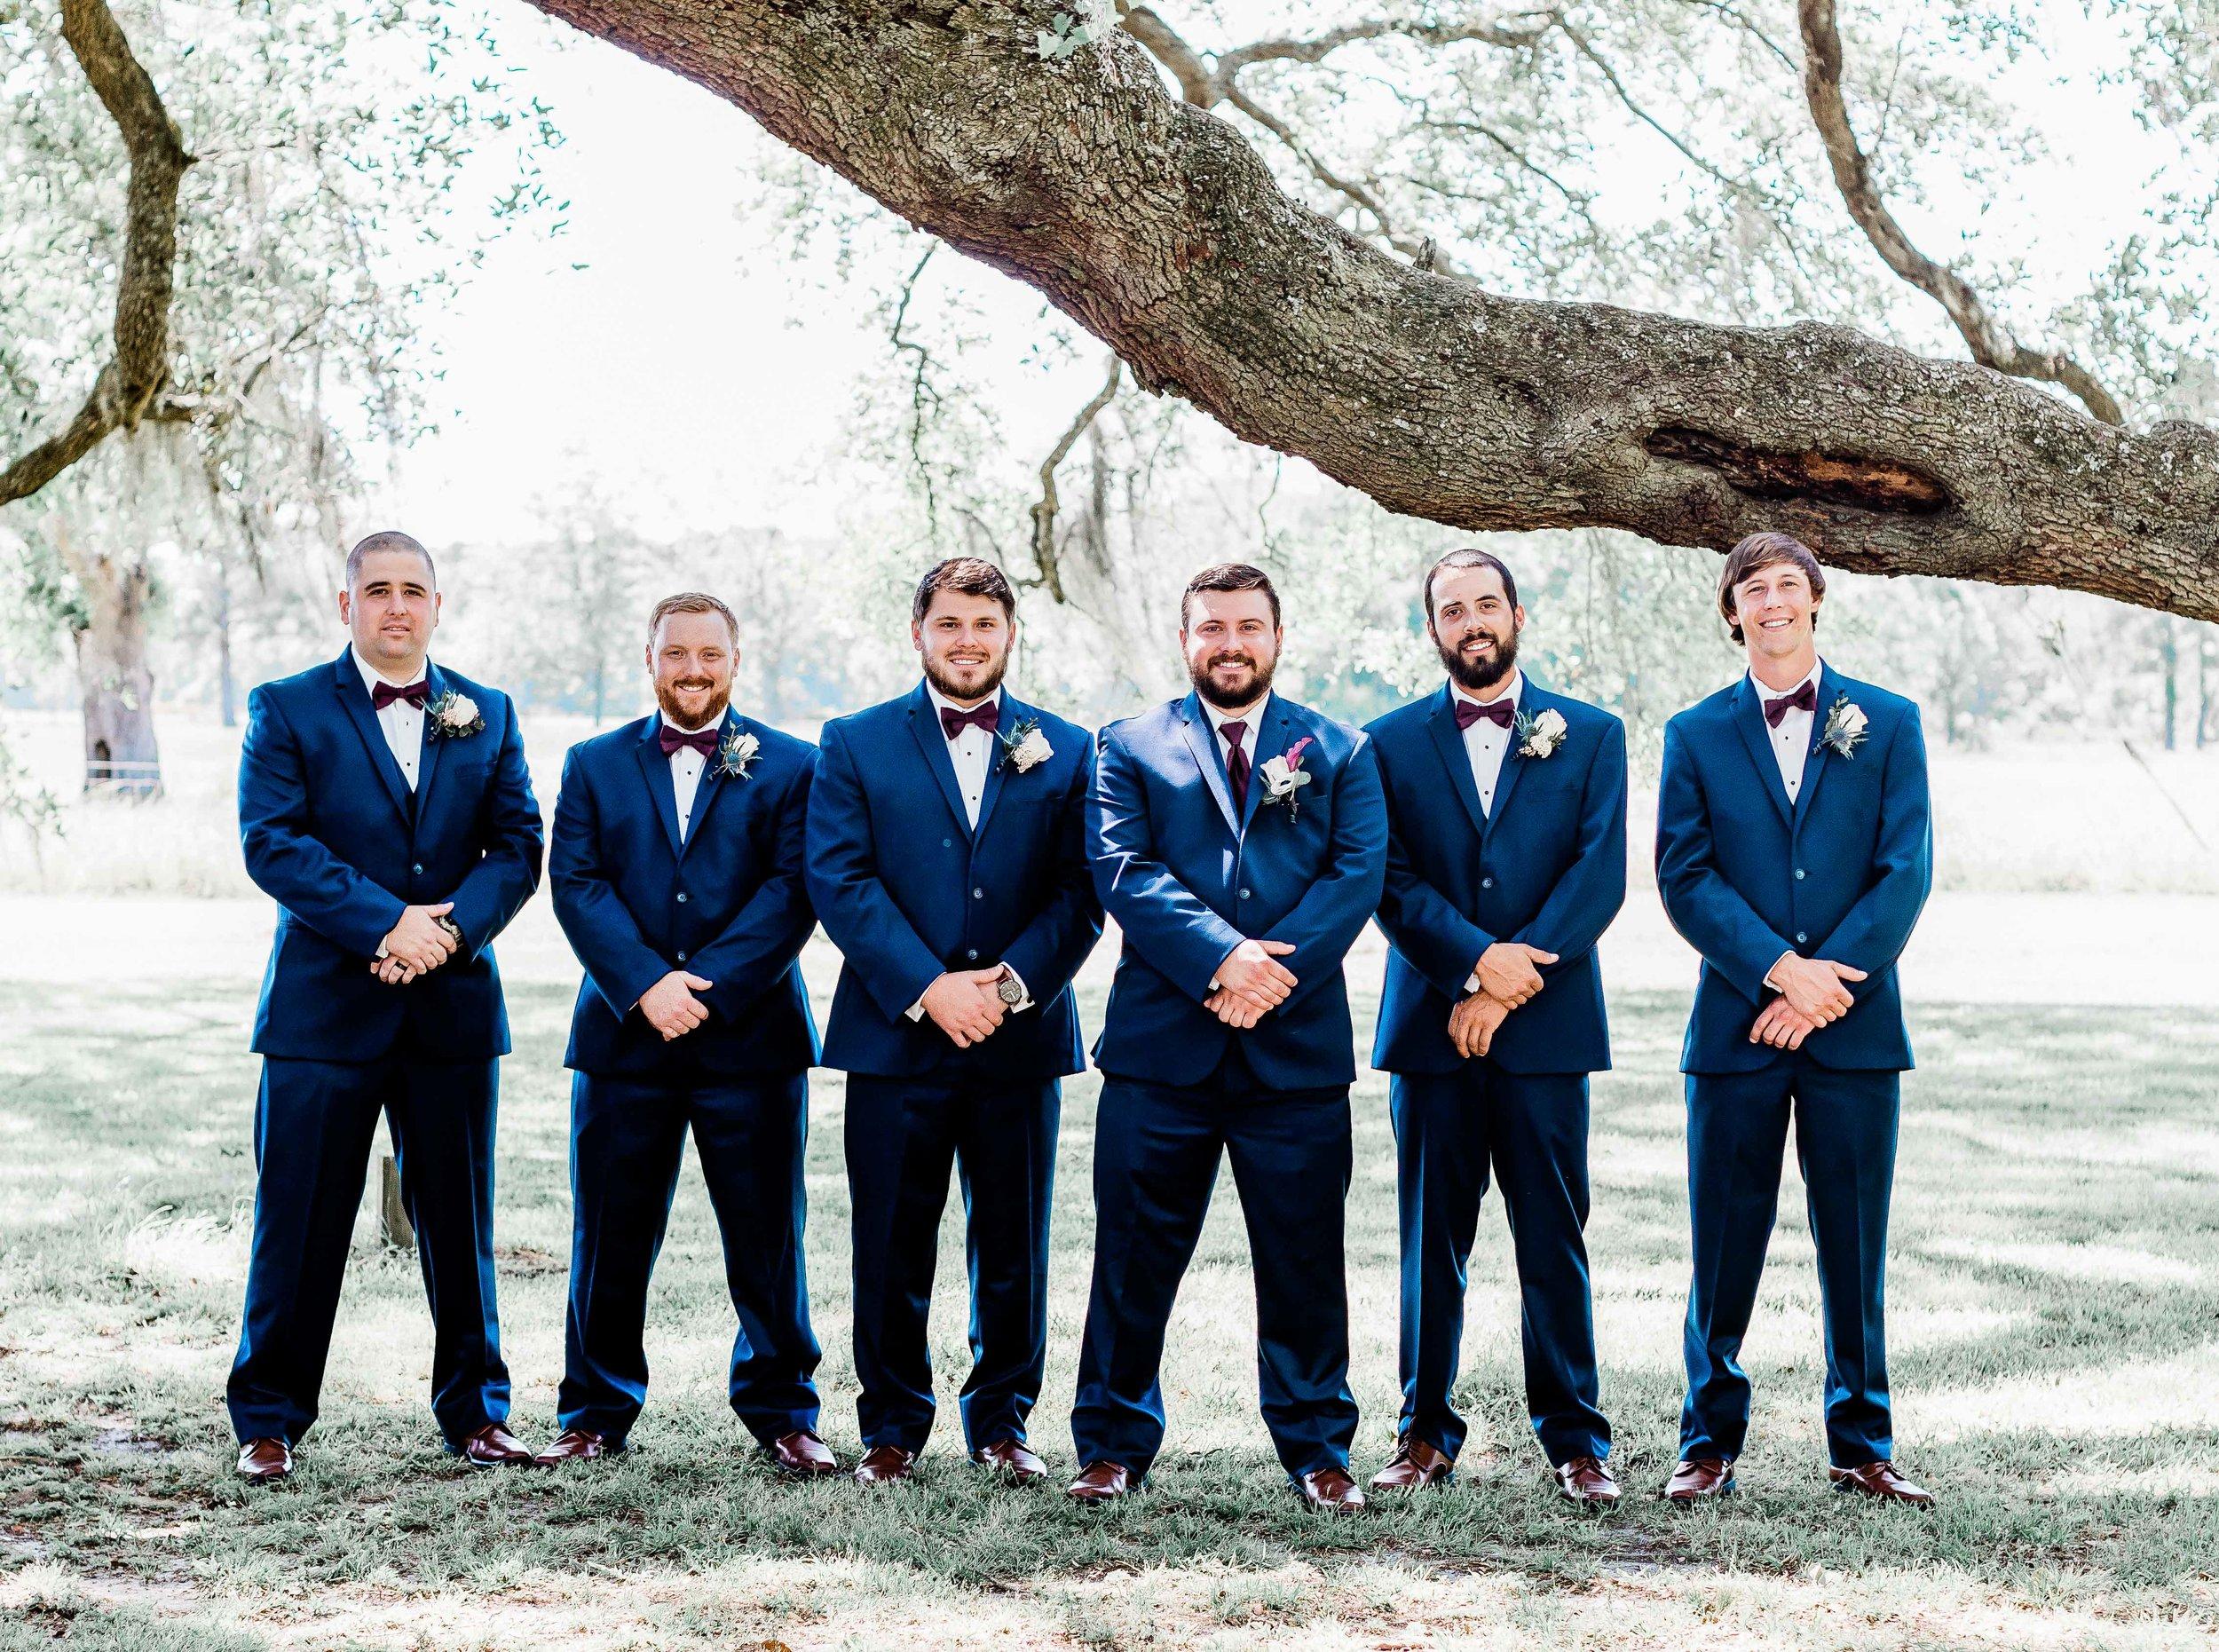 20190427-Southern Lens Photography- Savannah Wedding Photographer-Screven and Caroline-201953.jpg